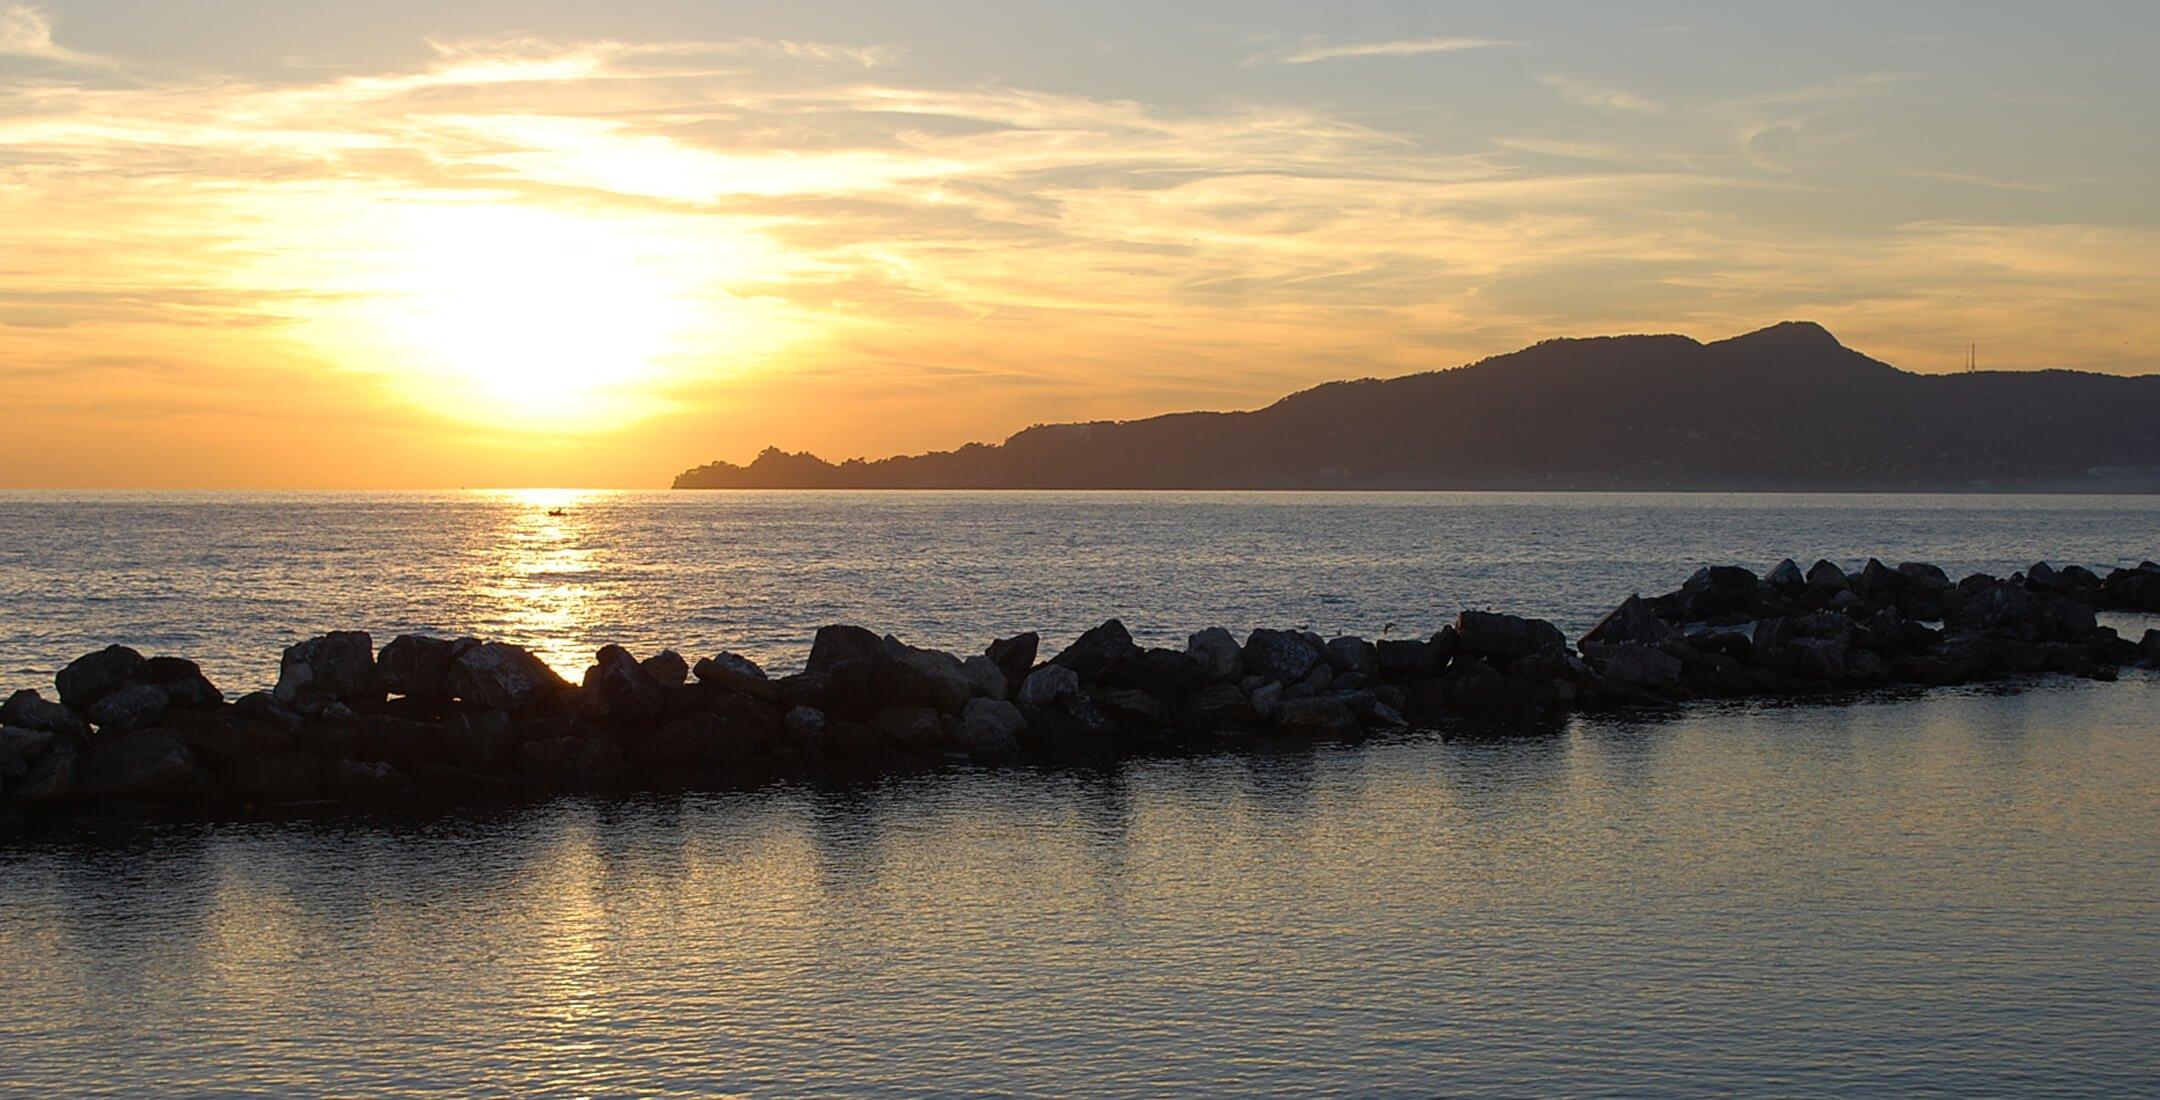 Tramonto sul Golfo del Tigullio (Chiavari)